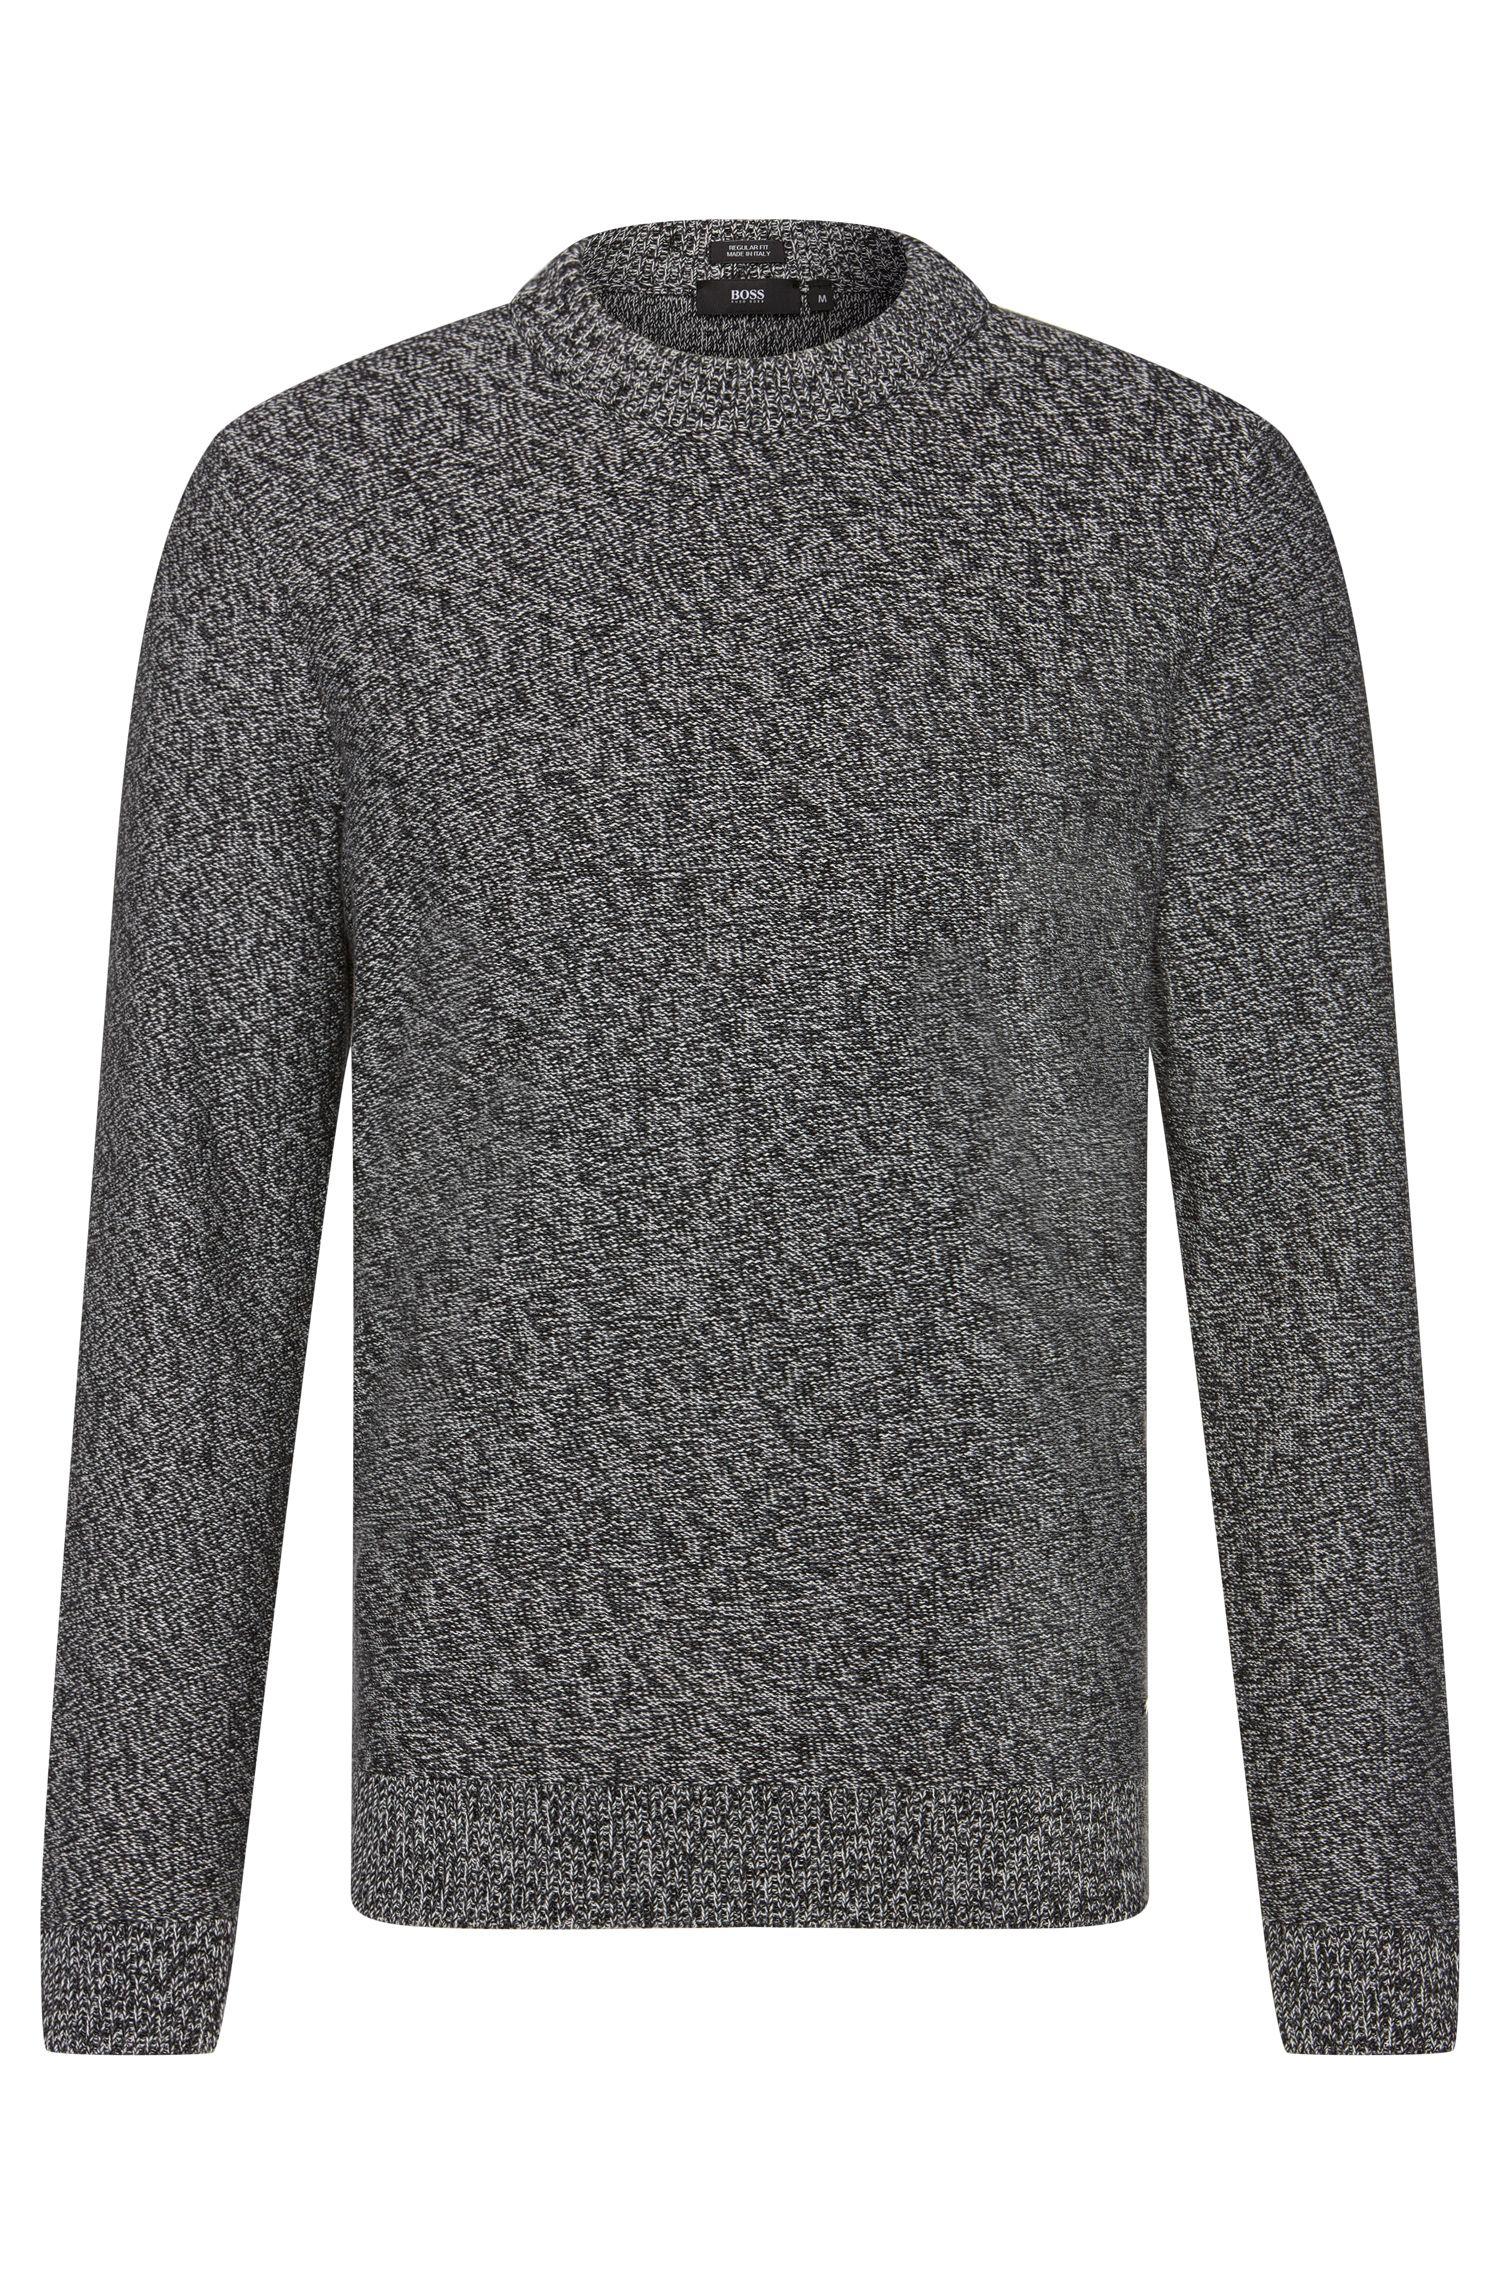 'Igus' | Italian Mouline Cotton Melange Sweater